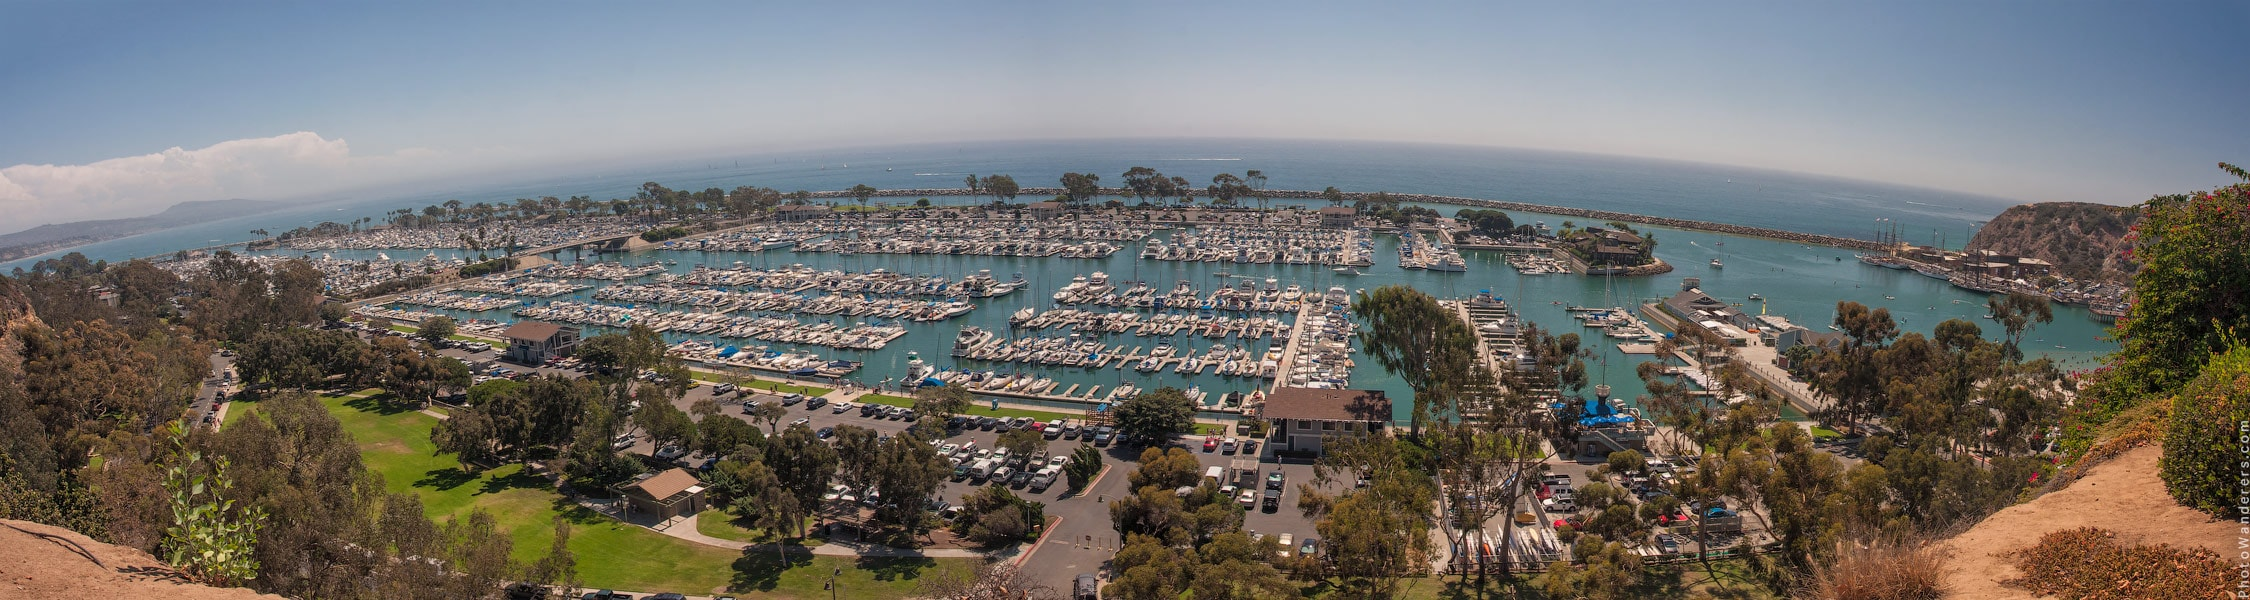 Панорама бухты Сан-Хуан (San Juan Bay), Калифорния